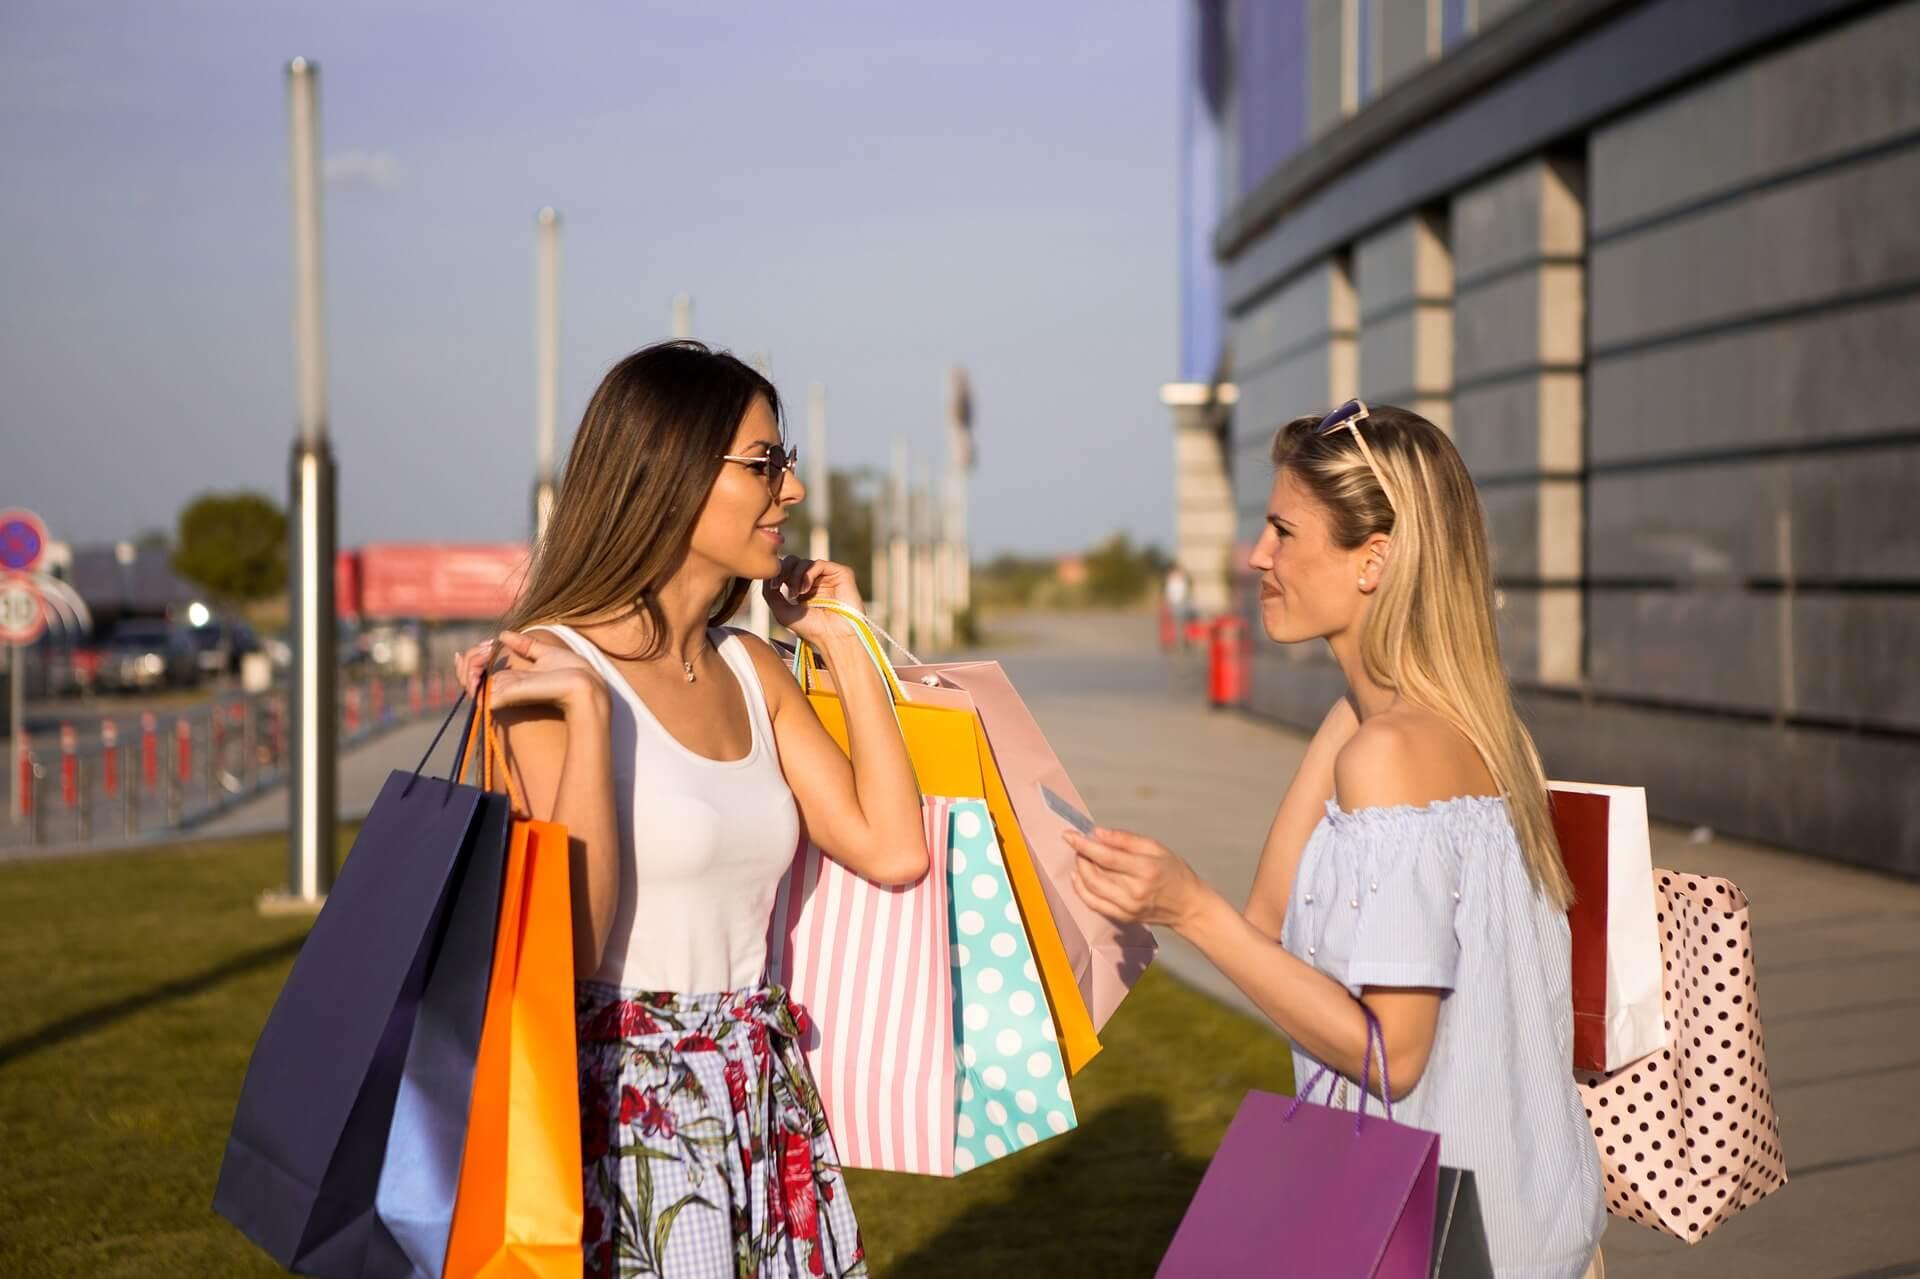 customer service shopping retention returning crm